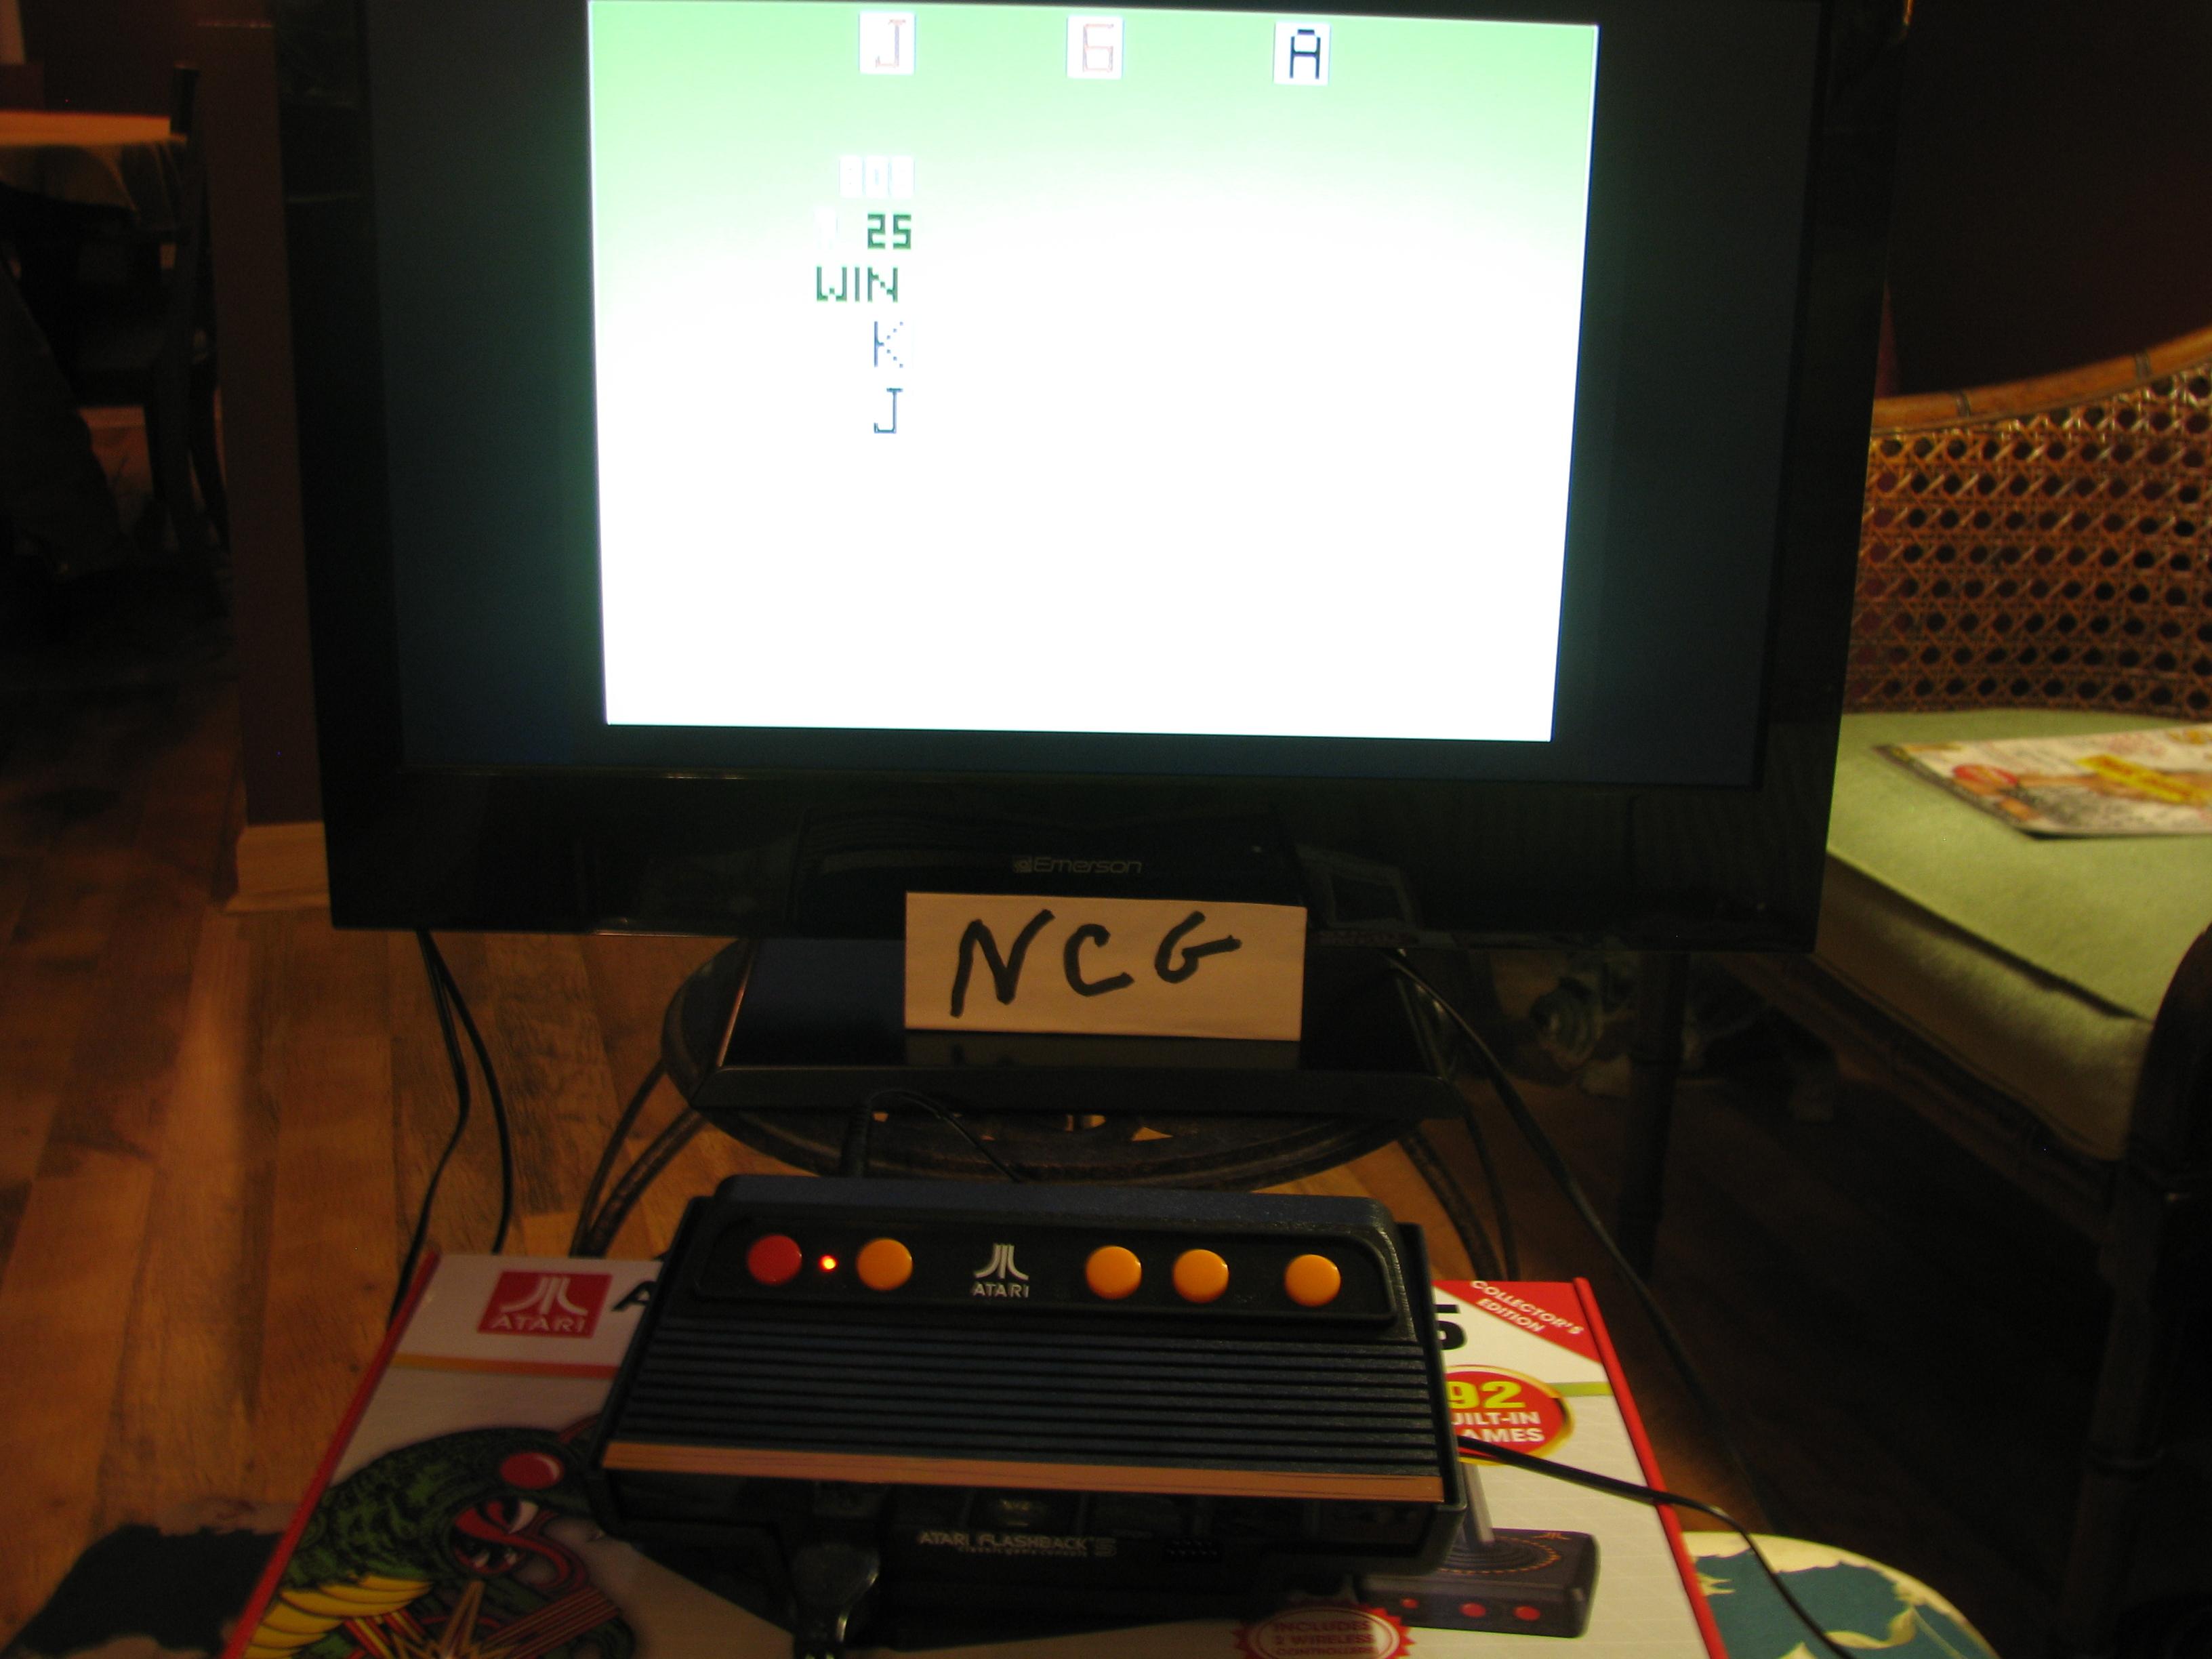 NorthCoastGamer: Blackjack (Atari Flashback 5) 809 points on 2015-01-12 20:55:28